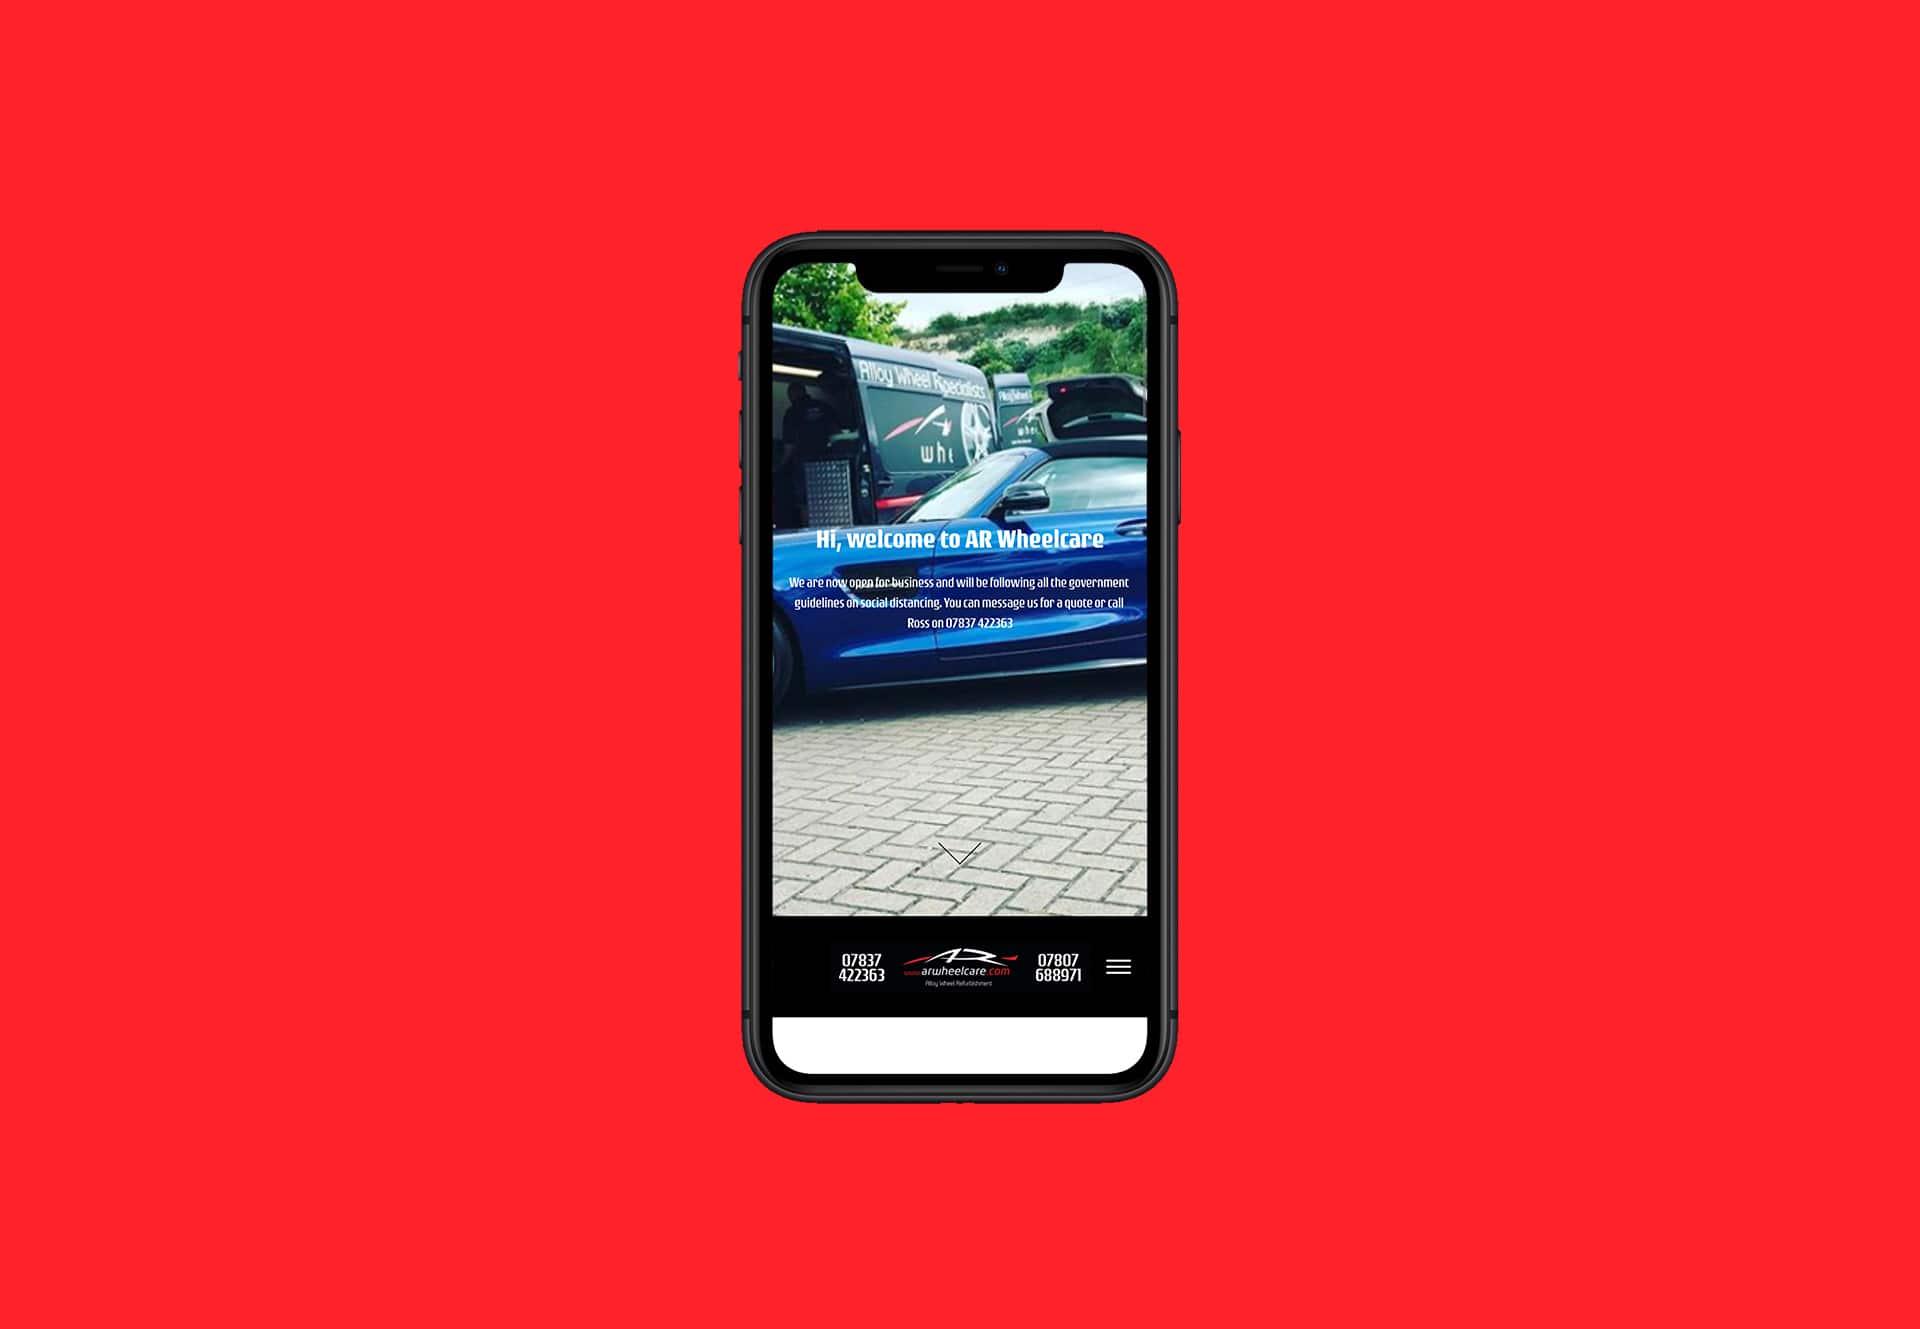 AR Wheel Care iphone